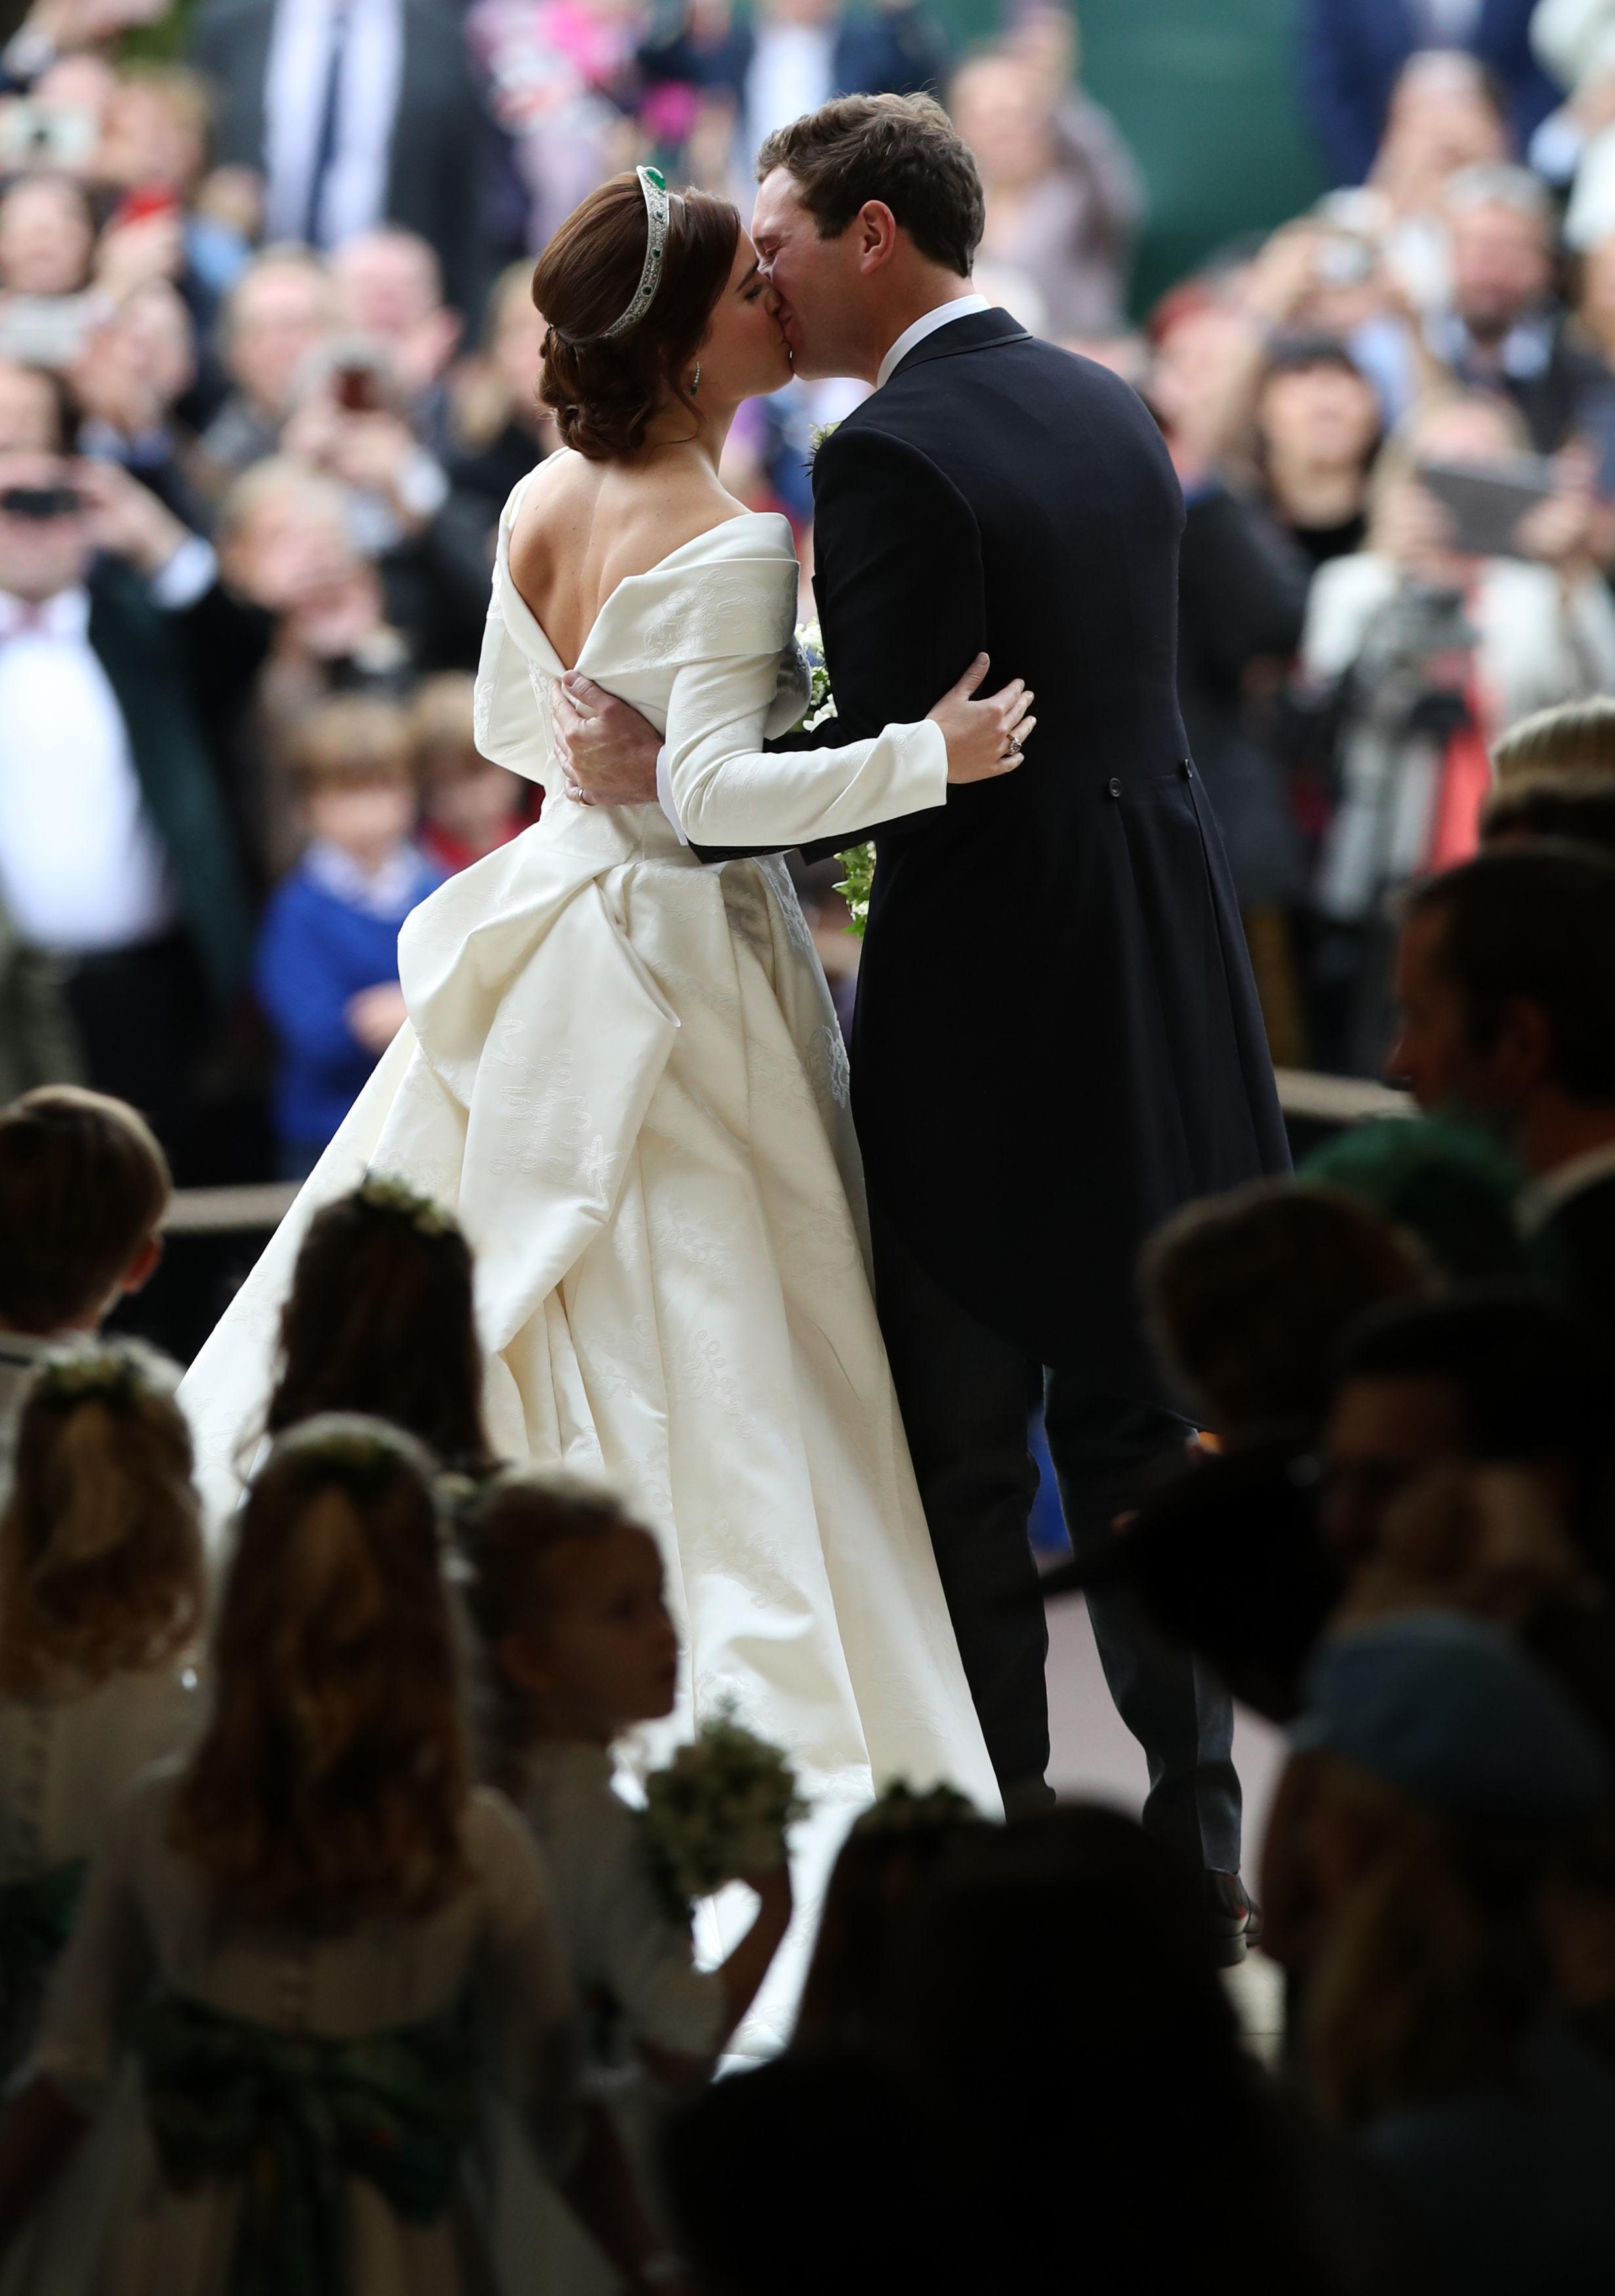 Princess Eugenie and Jack Brooksbank kissing at 2018 royal wedding